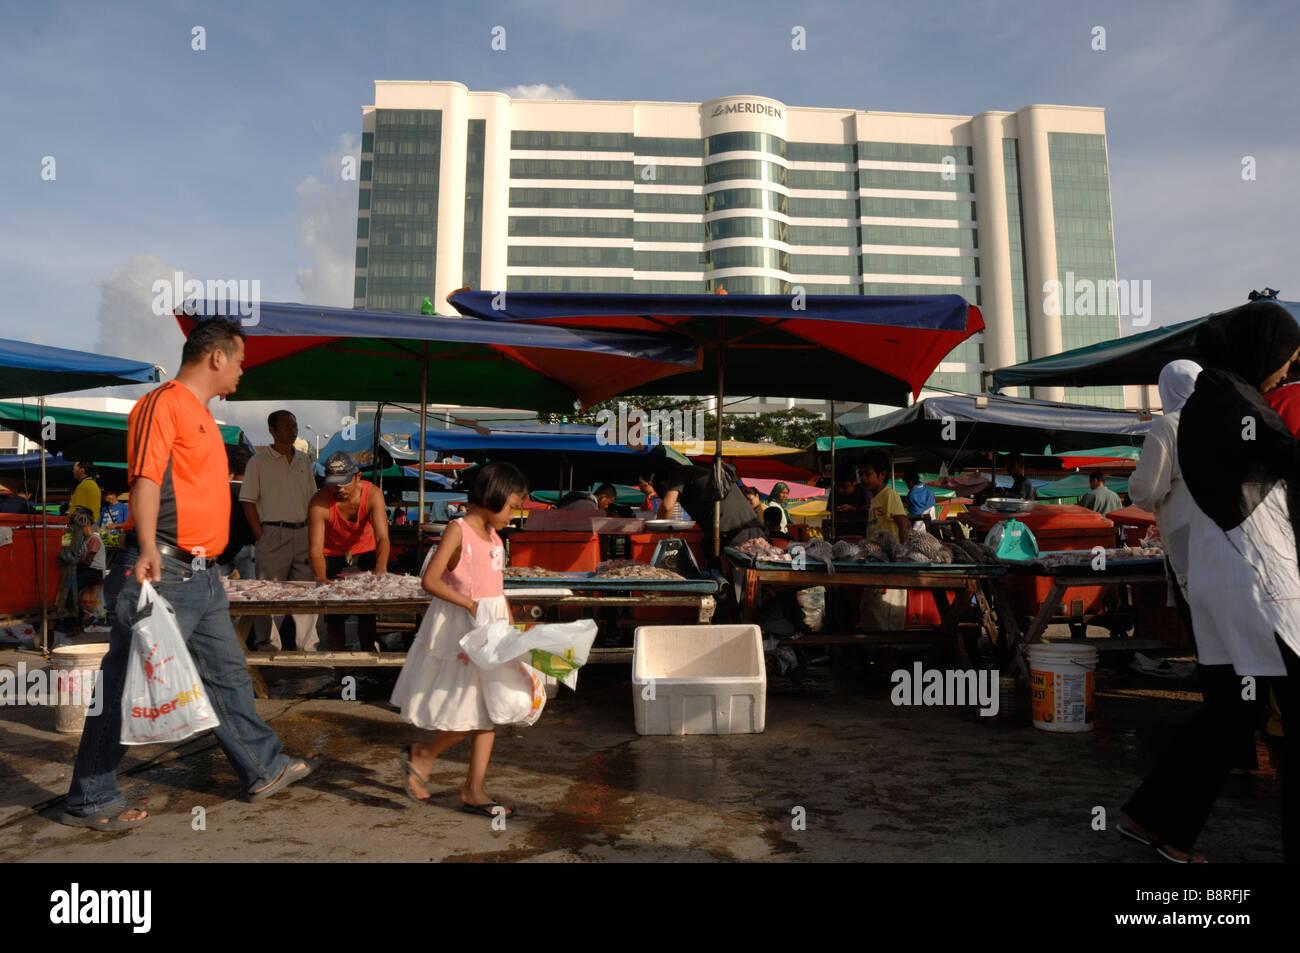 Customers and vendors selling and buying fish fish market waterfront Kota Kinabalu Sabah Malaysia Borneo South east - Stock Image